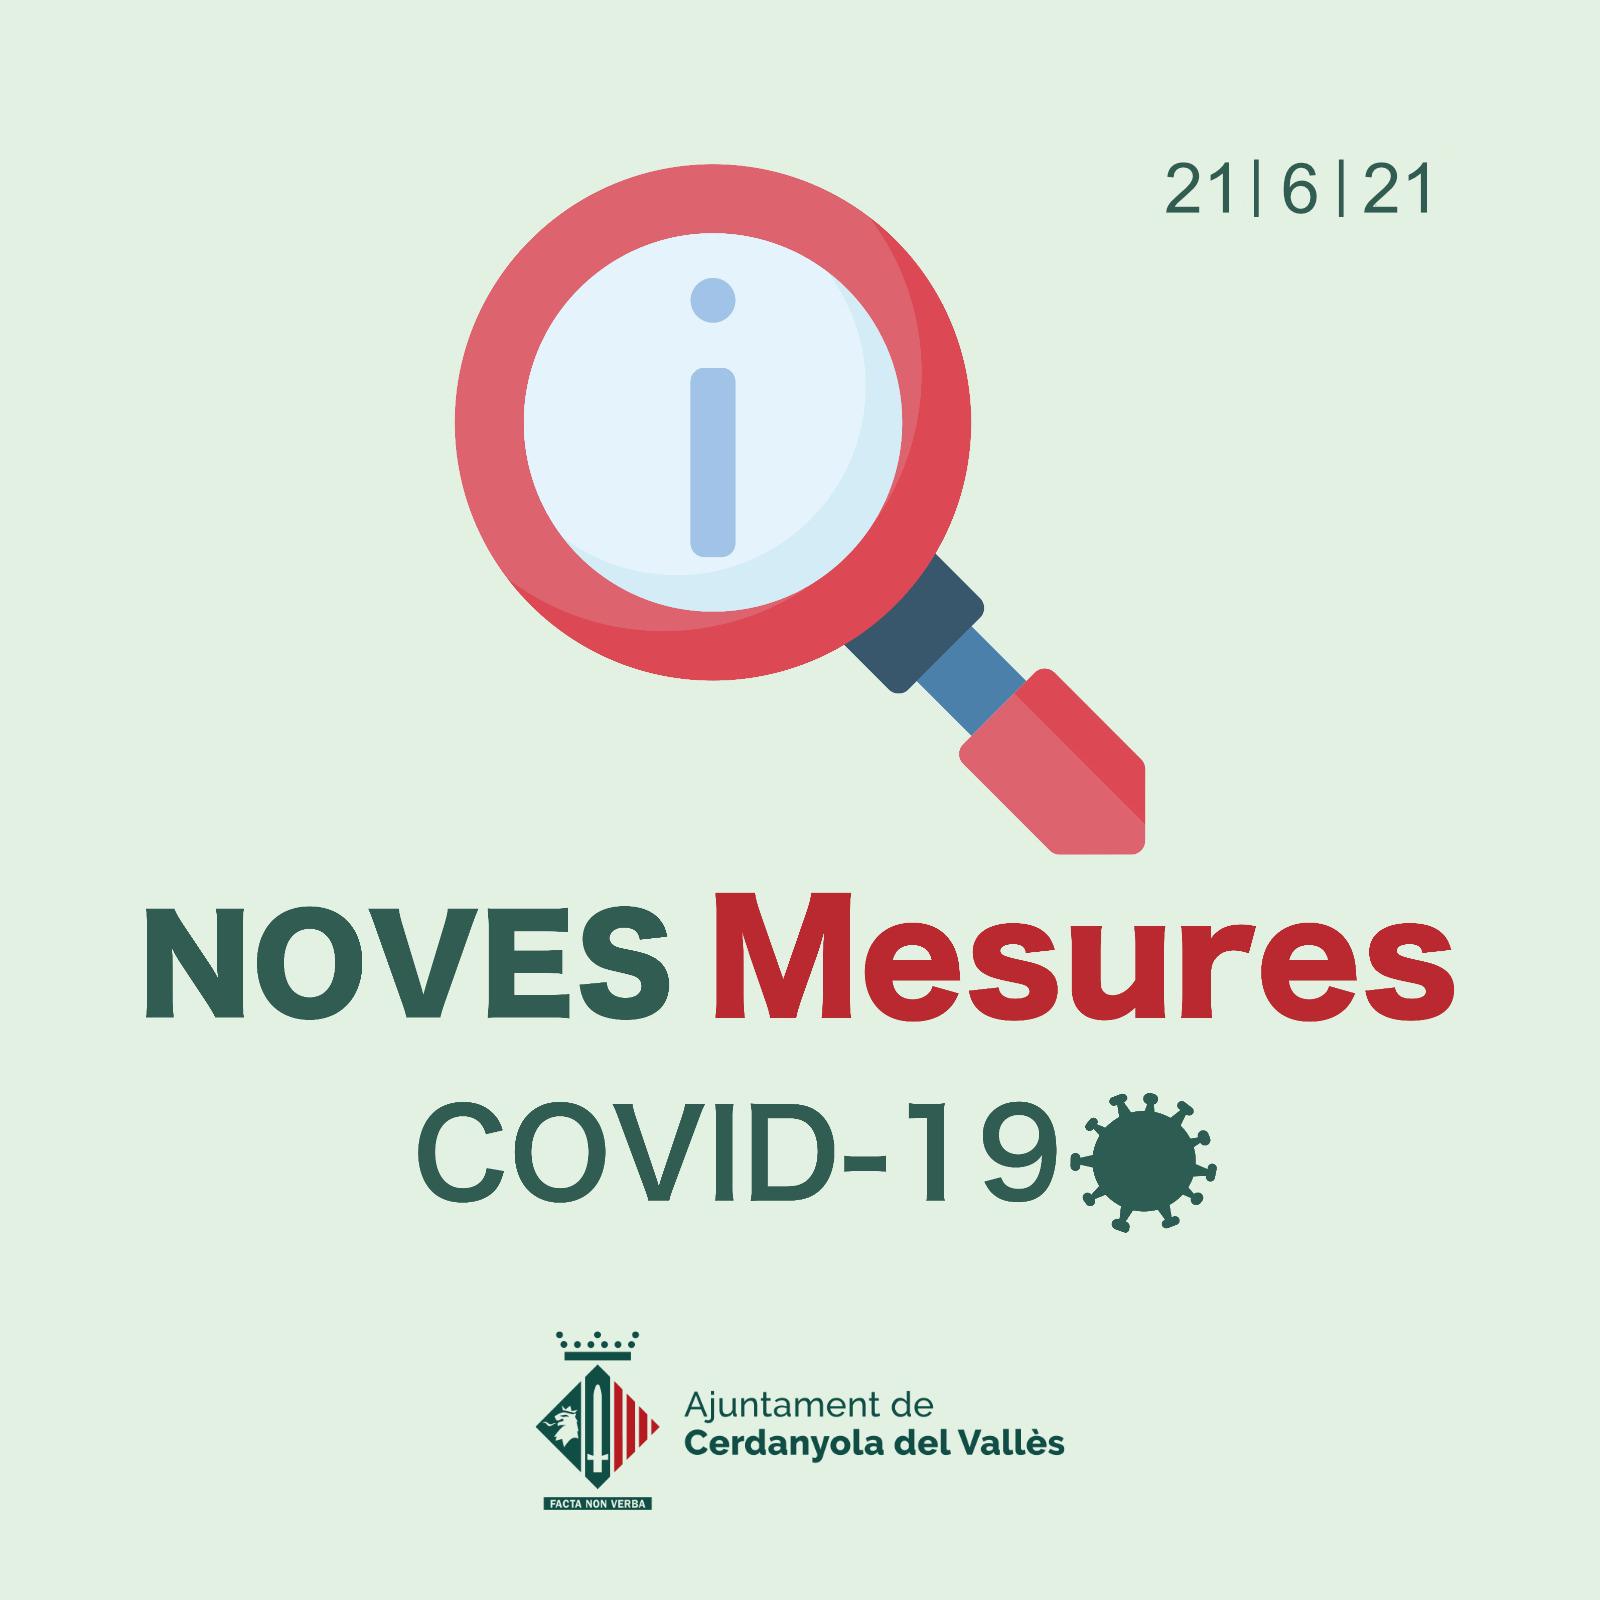 Imatge mesures COVID 21.6.21